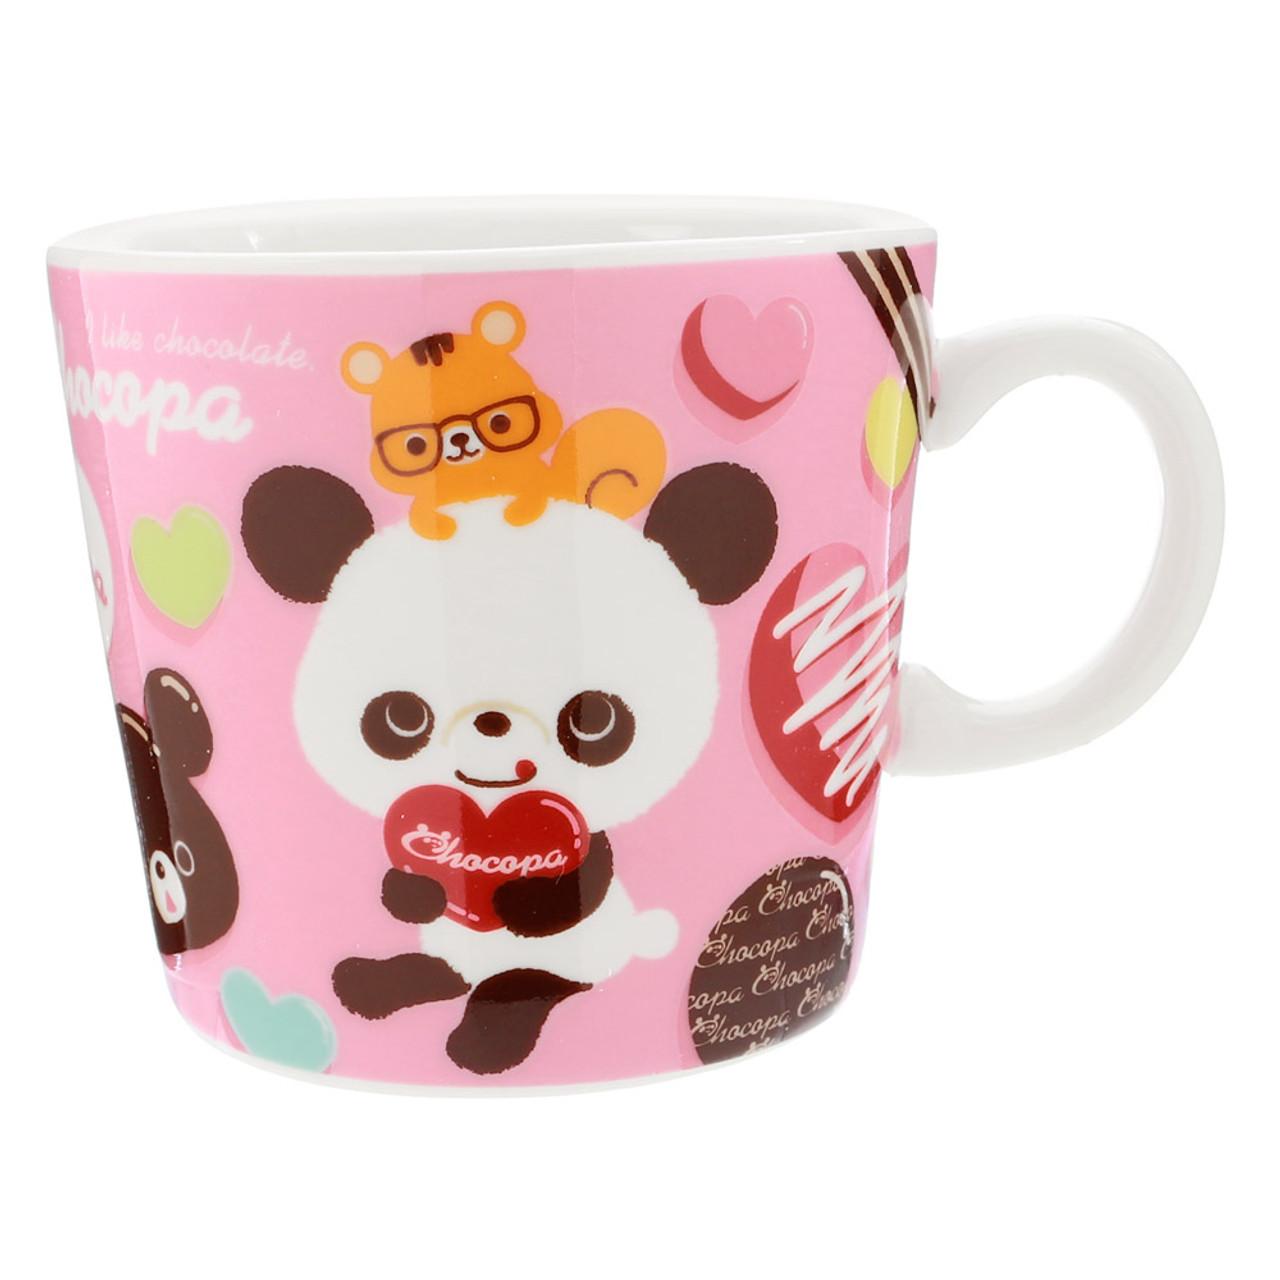 San-x Chocopa Panda Pink Porcelain Cup ( Front View )